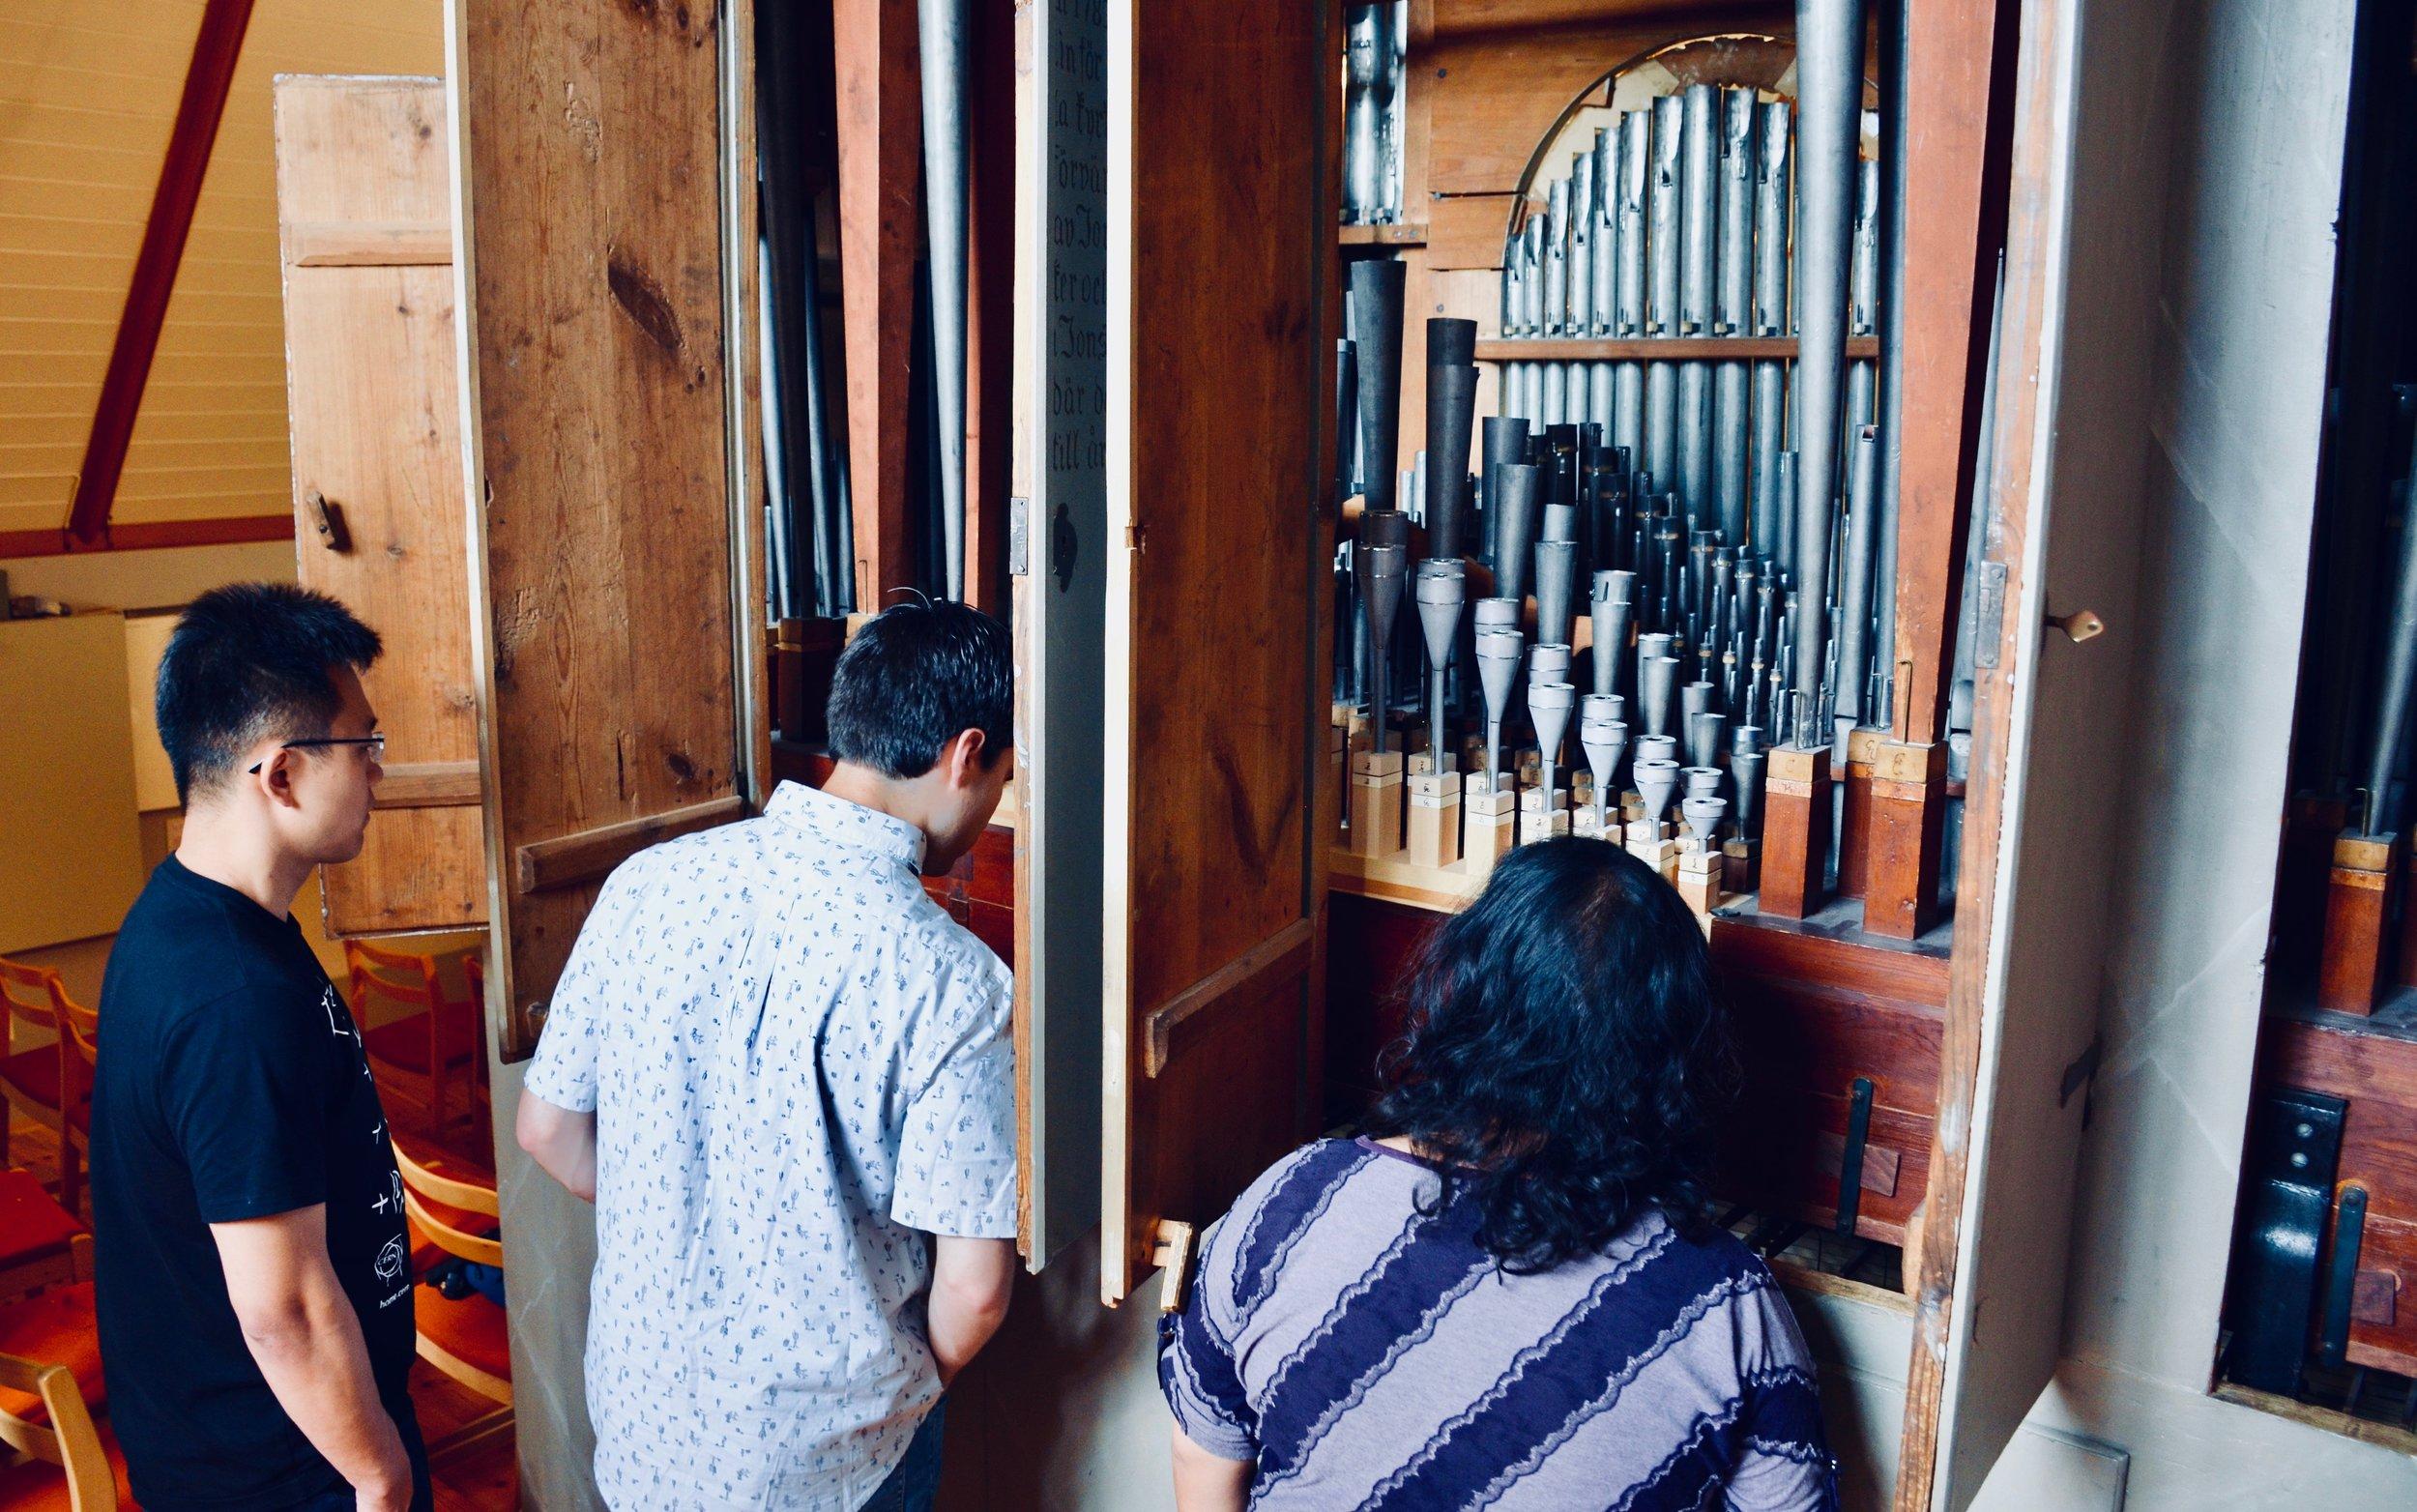 Looking inside the organ case of the 1783 Schiörlin organ in Jonsered, Sweden.